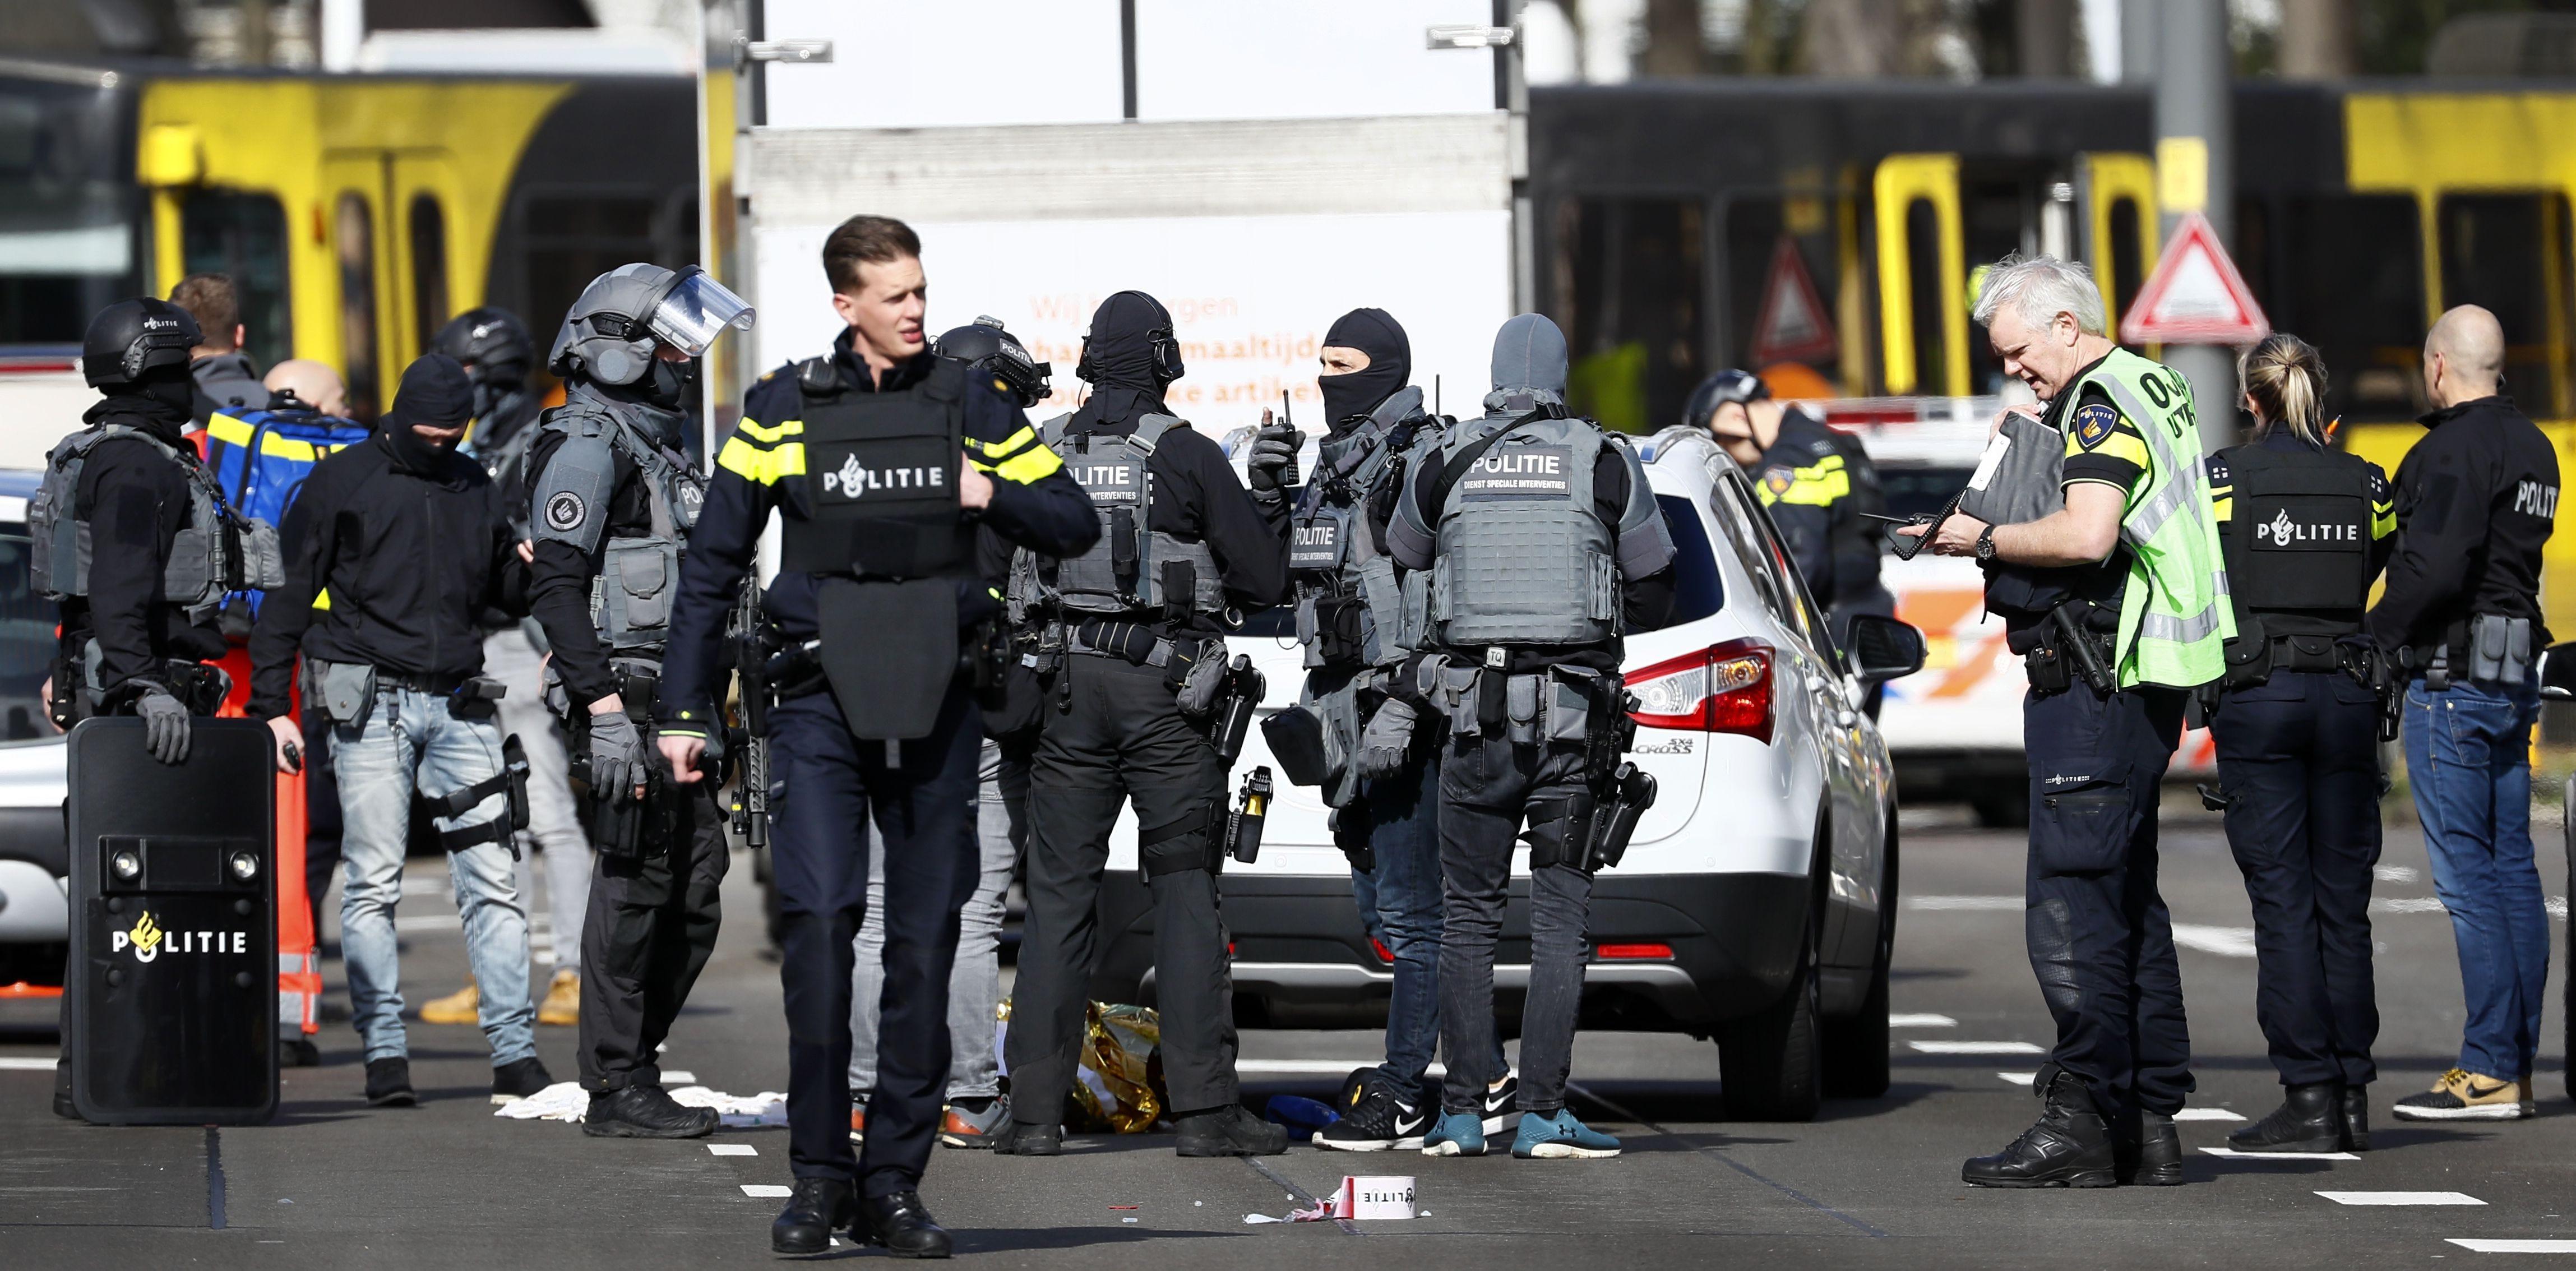 'We assume a terror motive': 3 killed on tram in Dutch city of Utrecht; suspect arrested